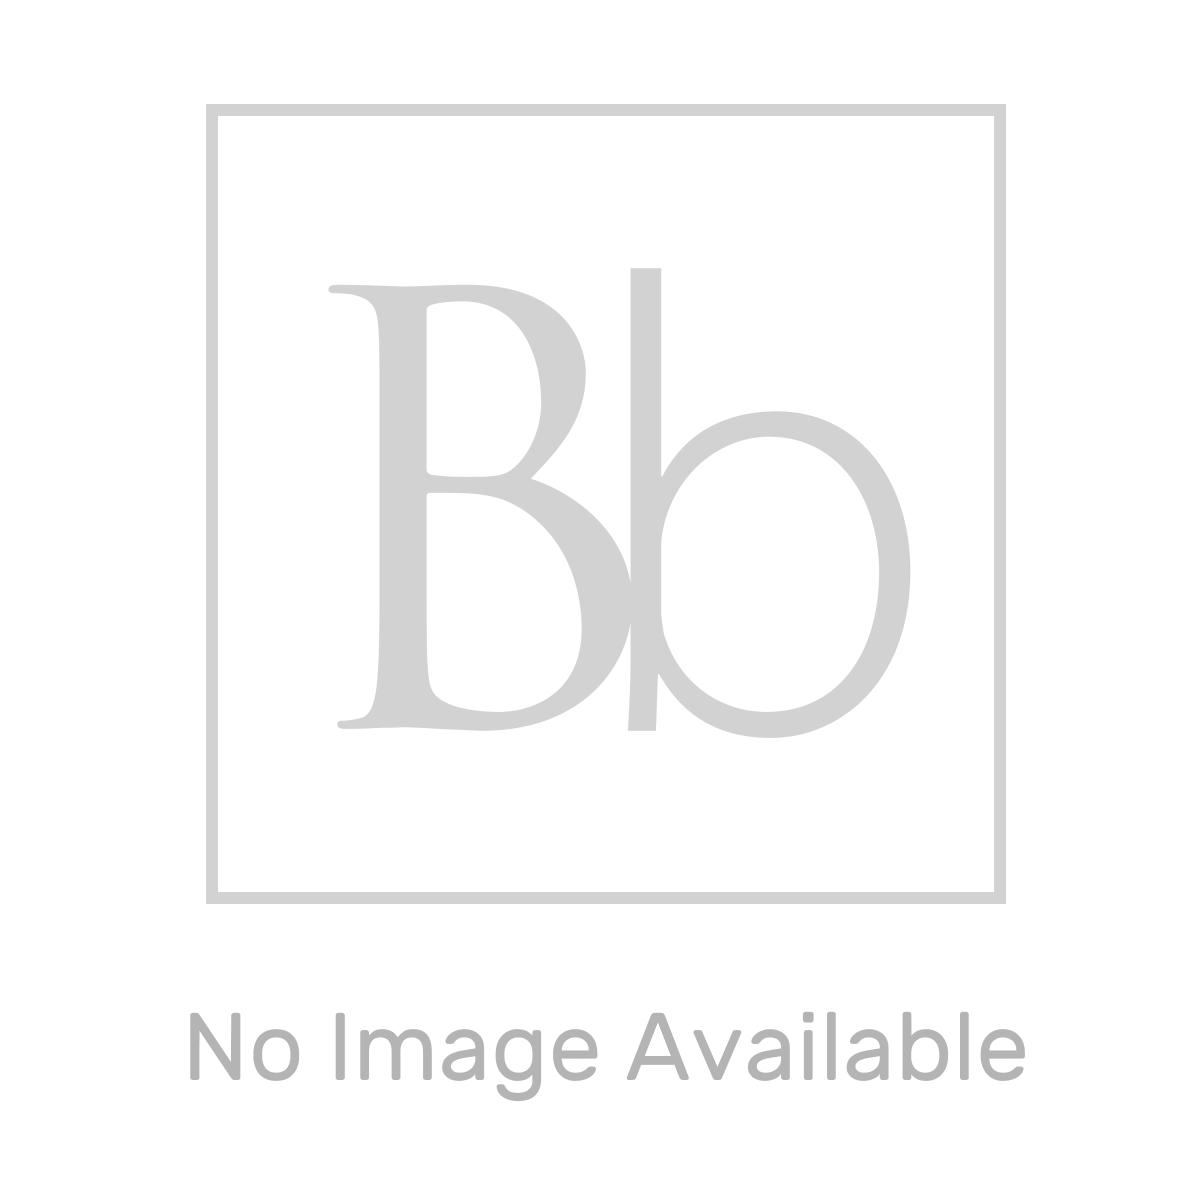 April Rectangular Anti Slip Shower Tray 1000 x 700 Line Drawing